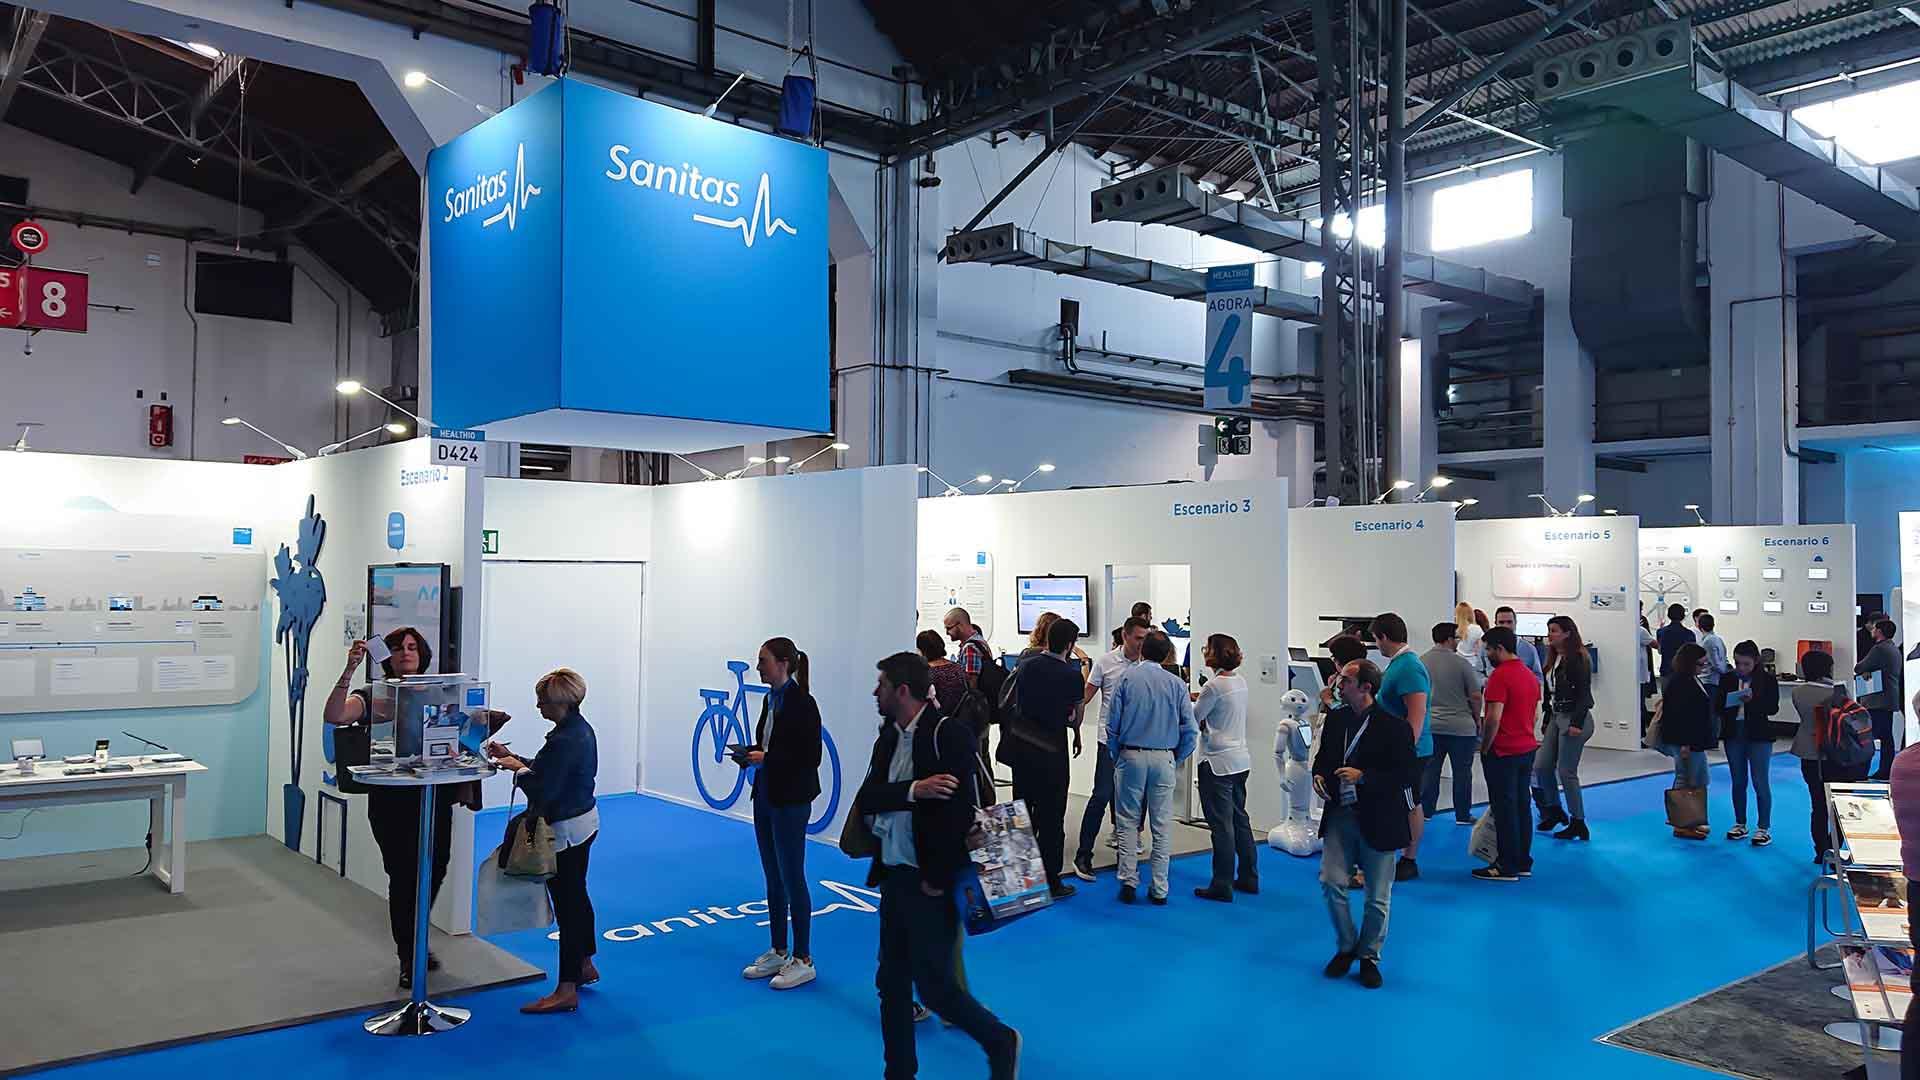 In(3D)dustry congress. Sanitas stand design